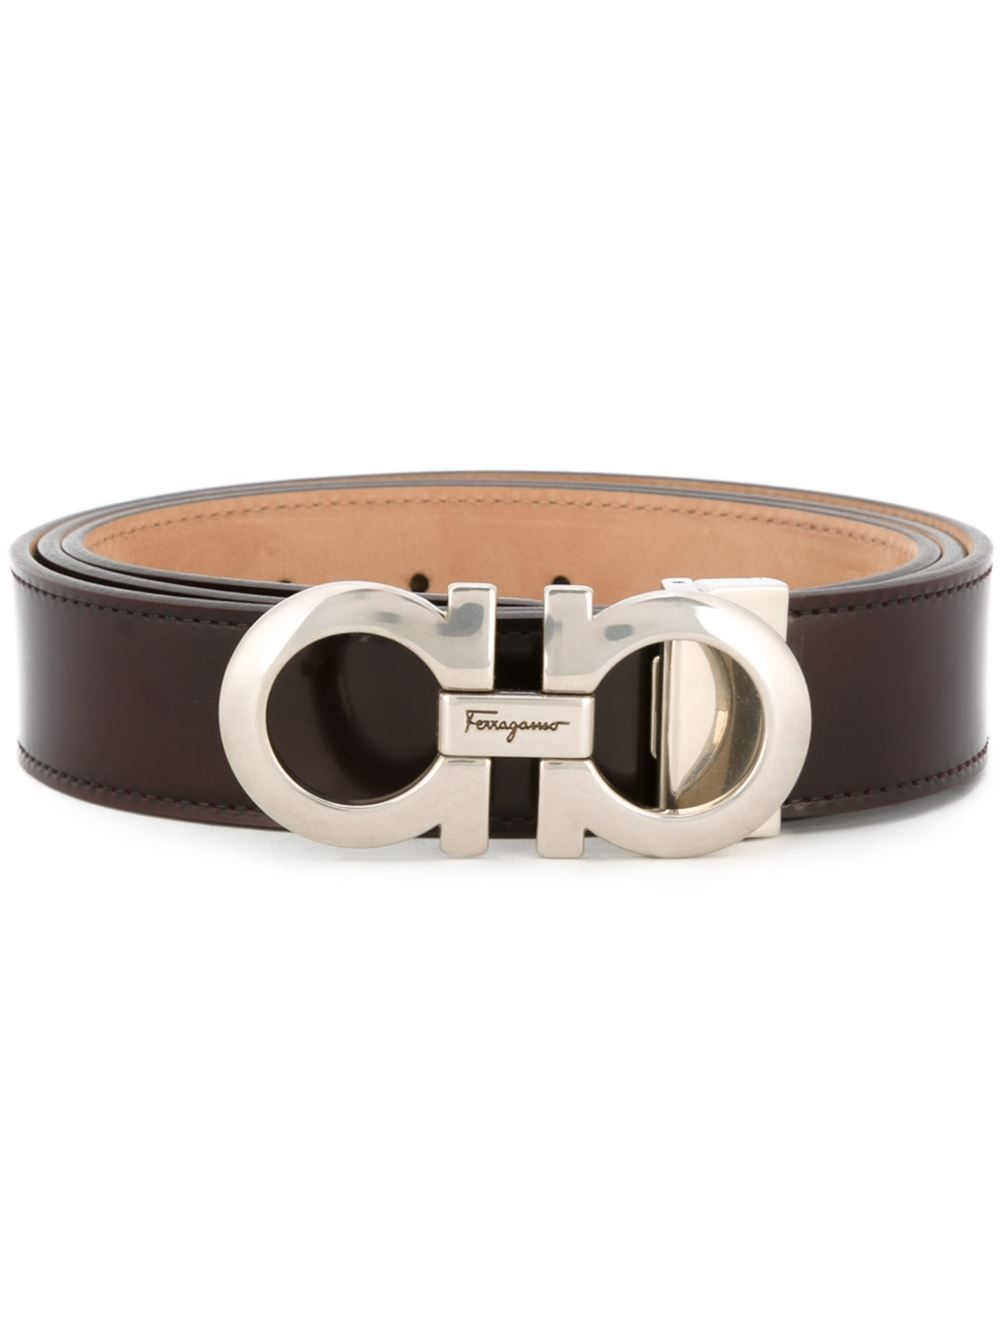 ferragamo gancini buckle belt in brown for lyst